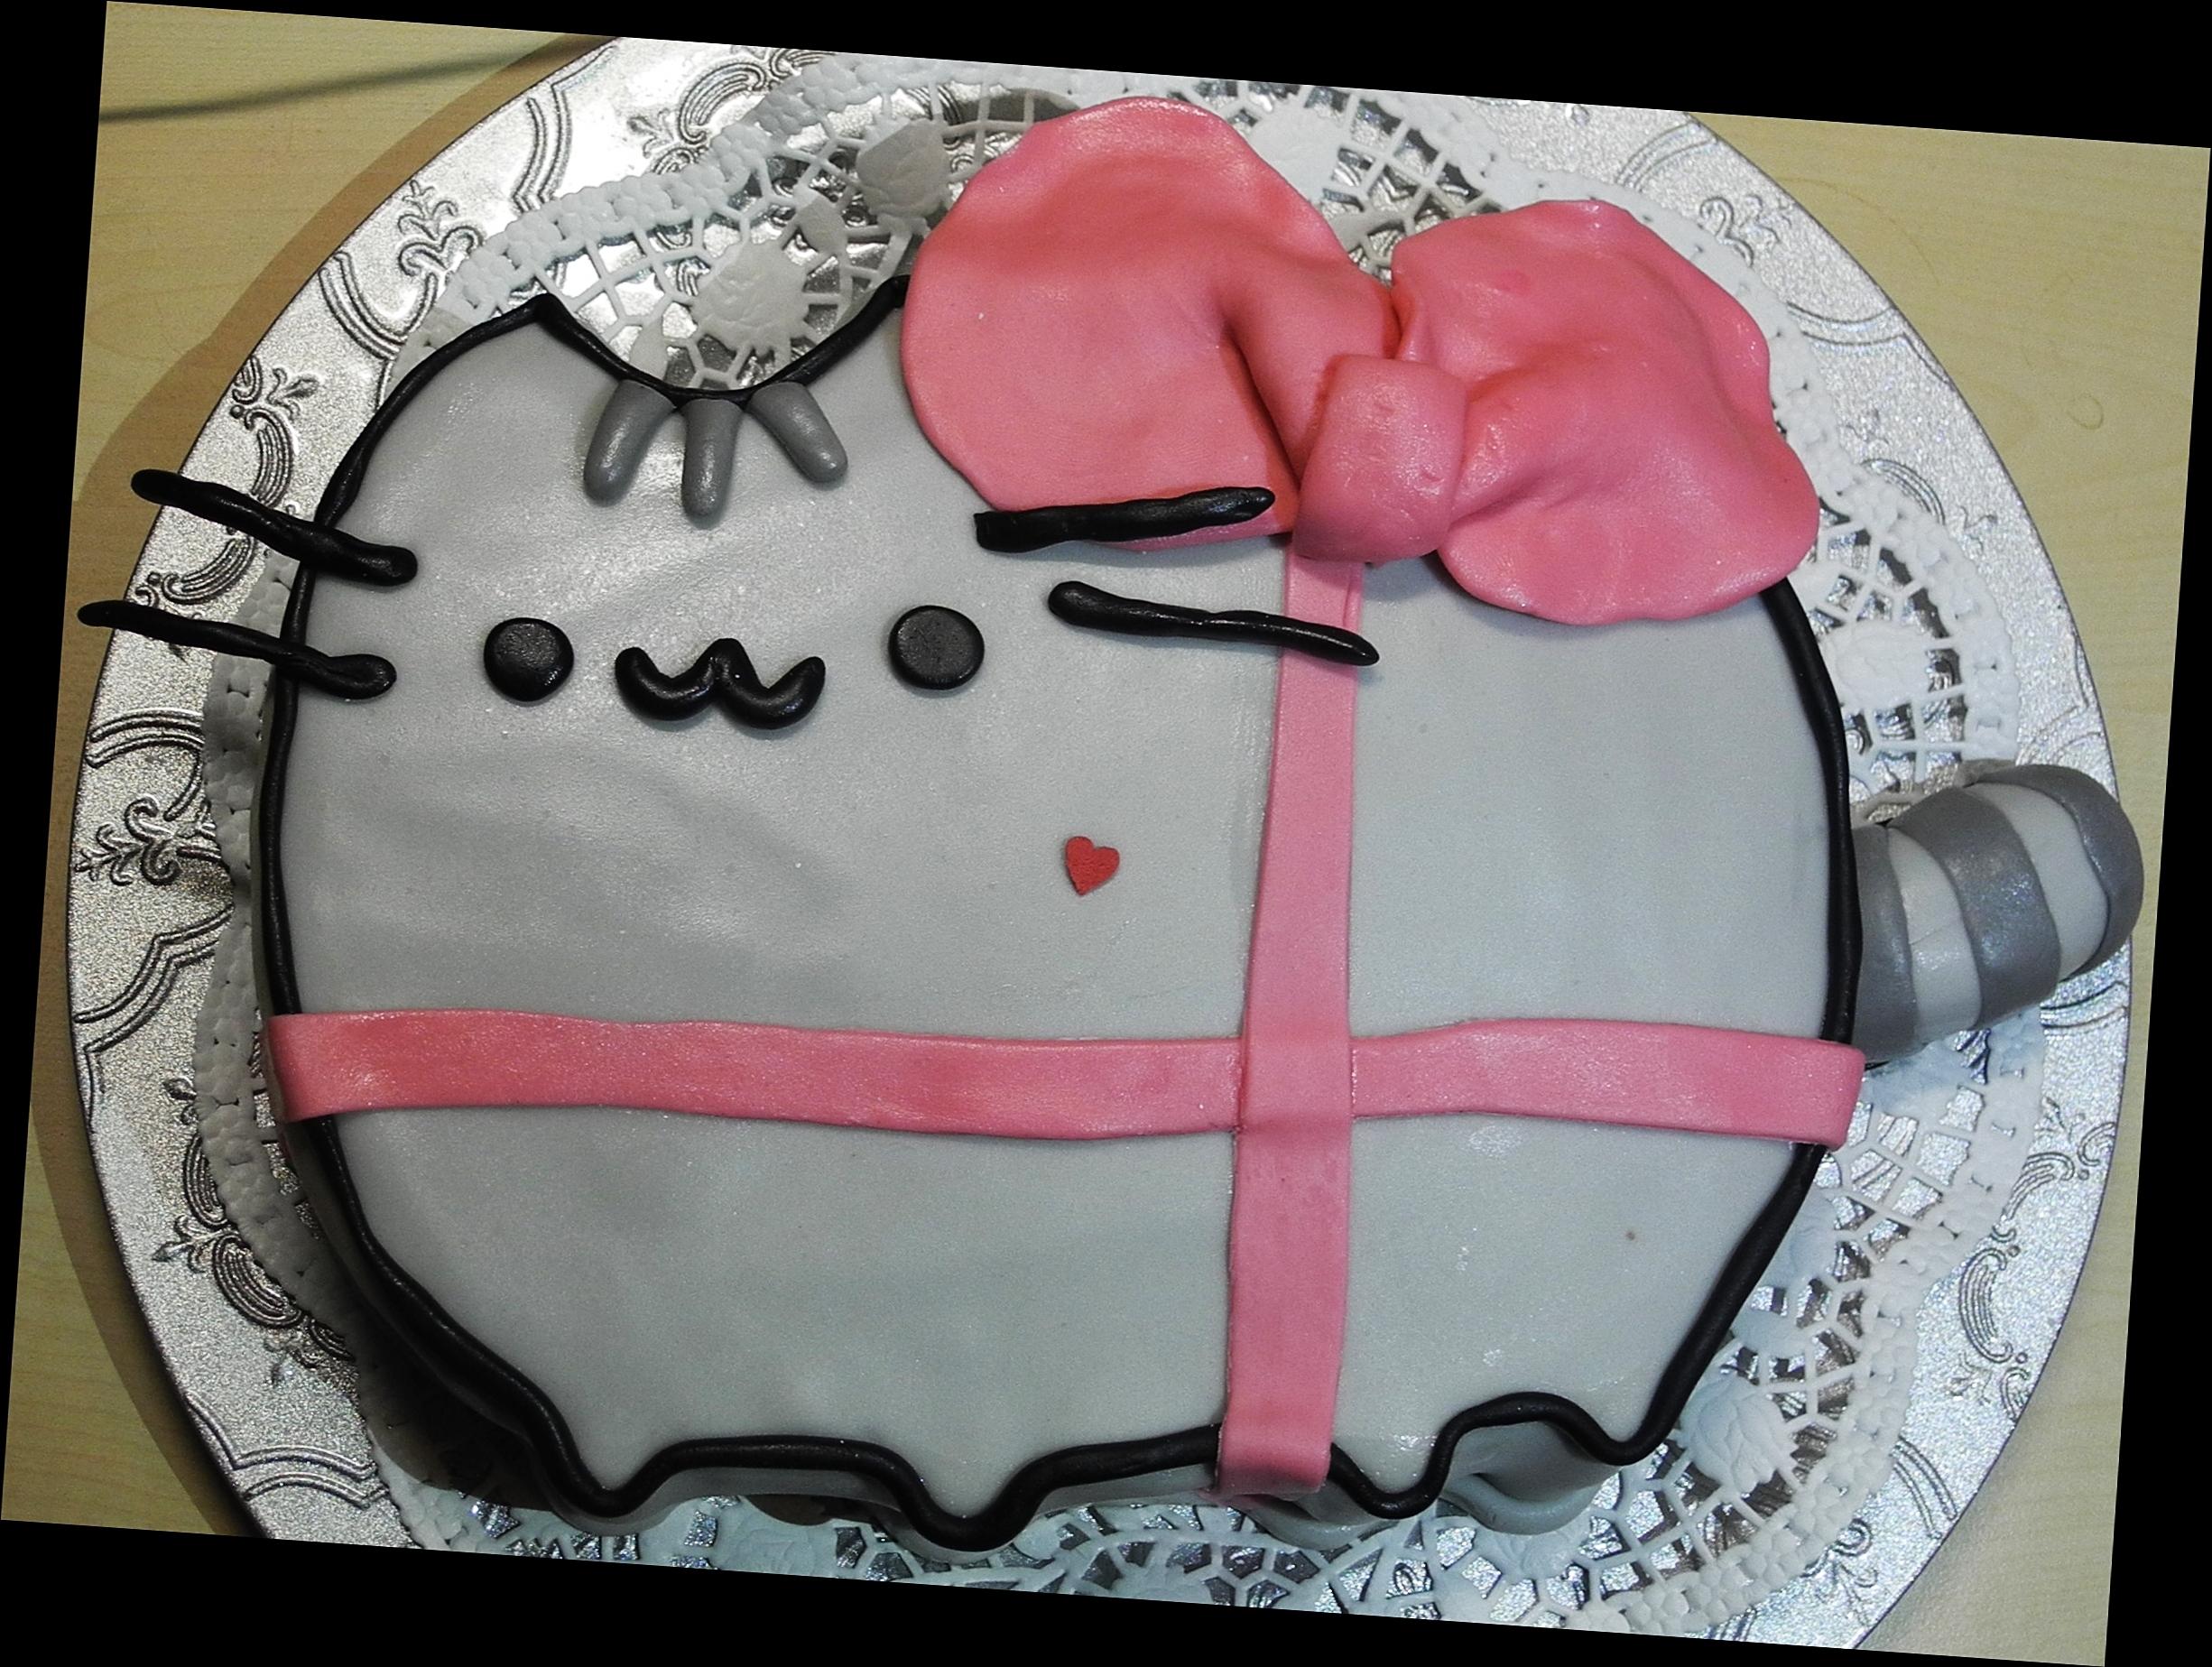 Pusheen Cat Cake Cakecentral Com